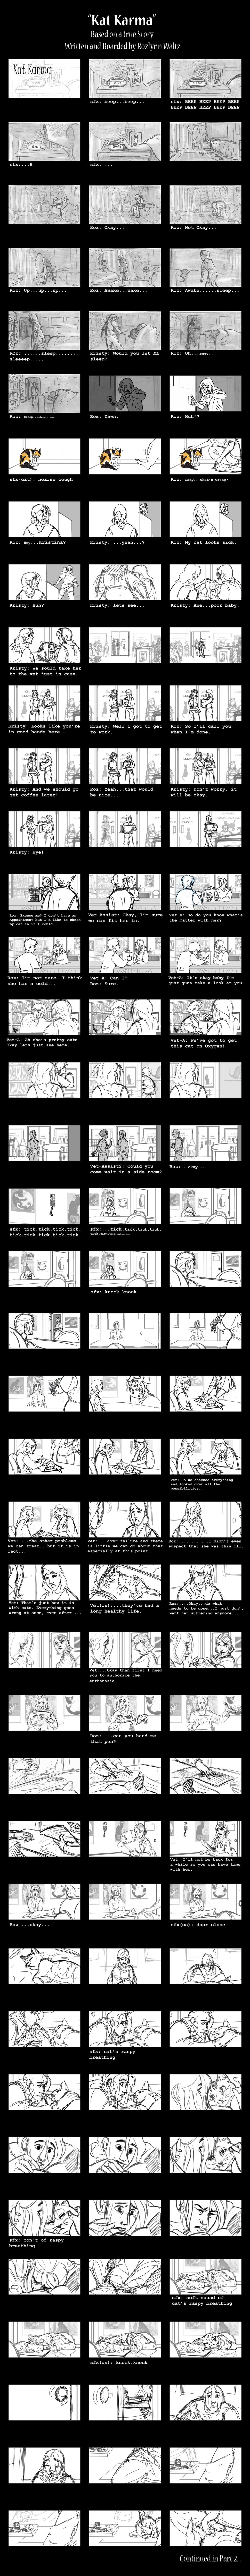 Kat Karma - storyboards - Part 1 by RozlynnWaltz